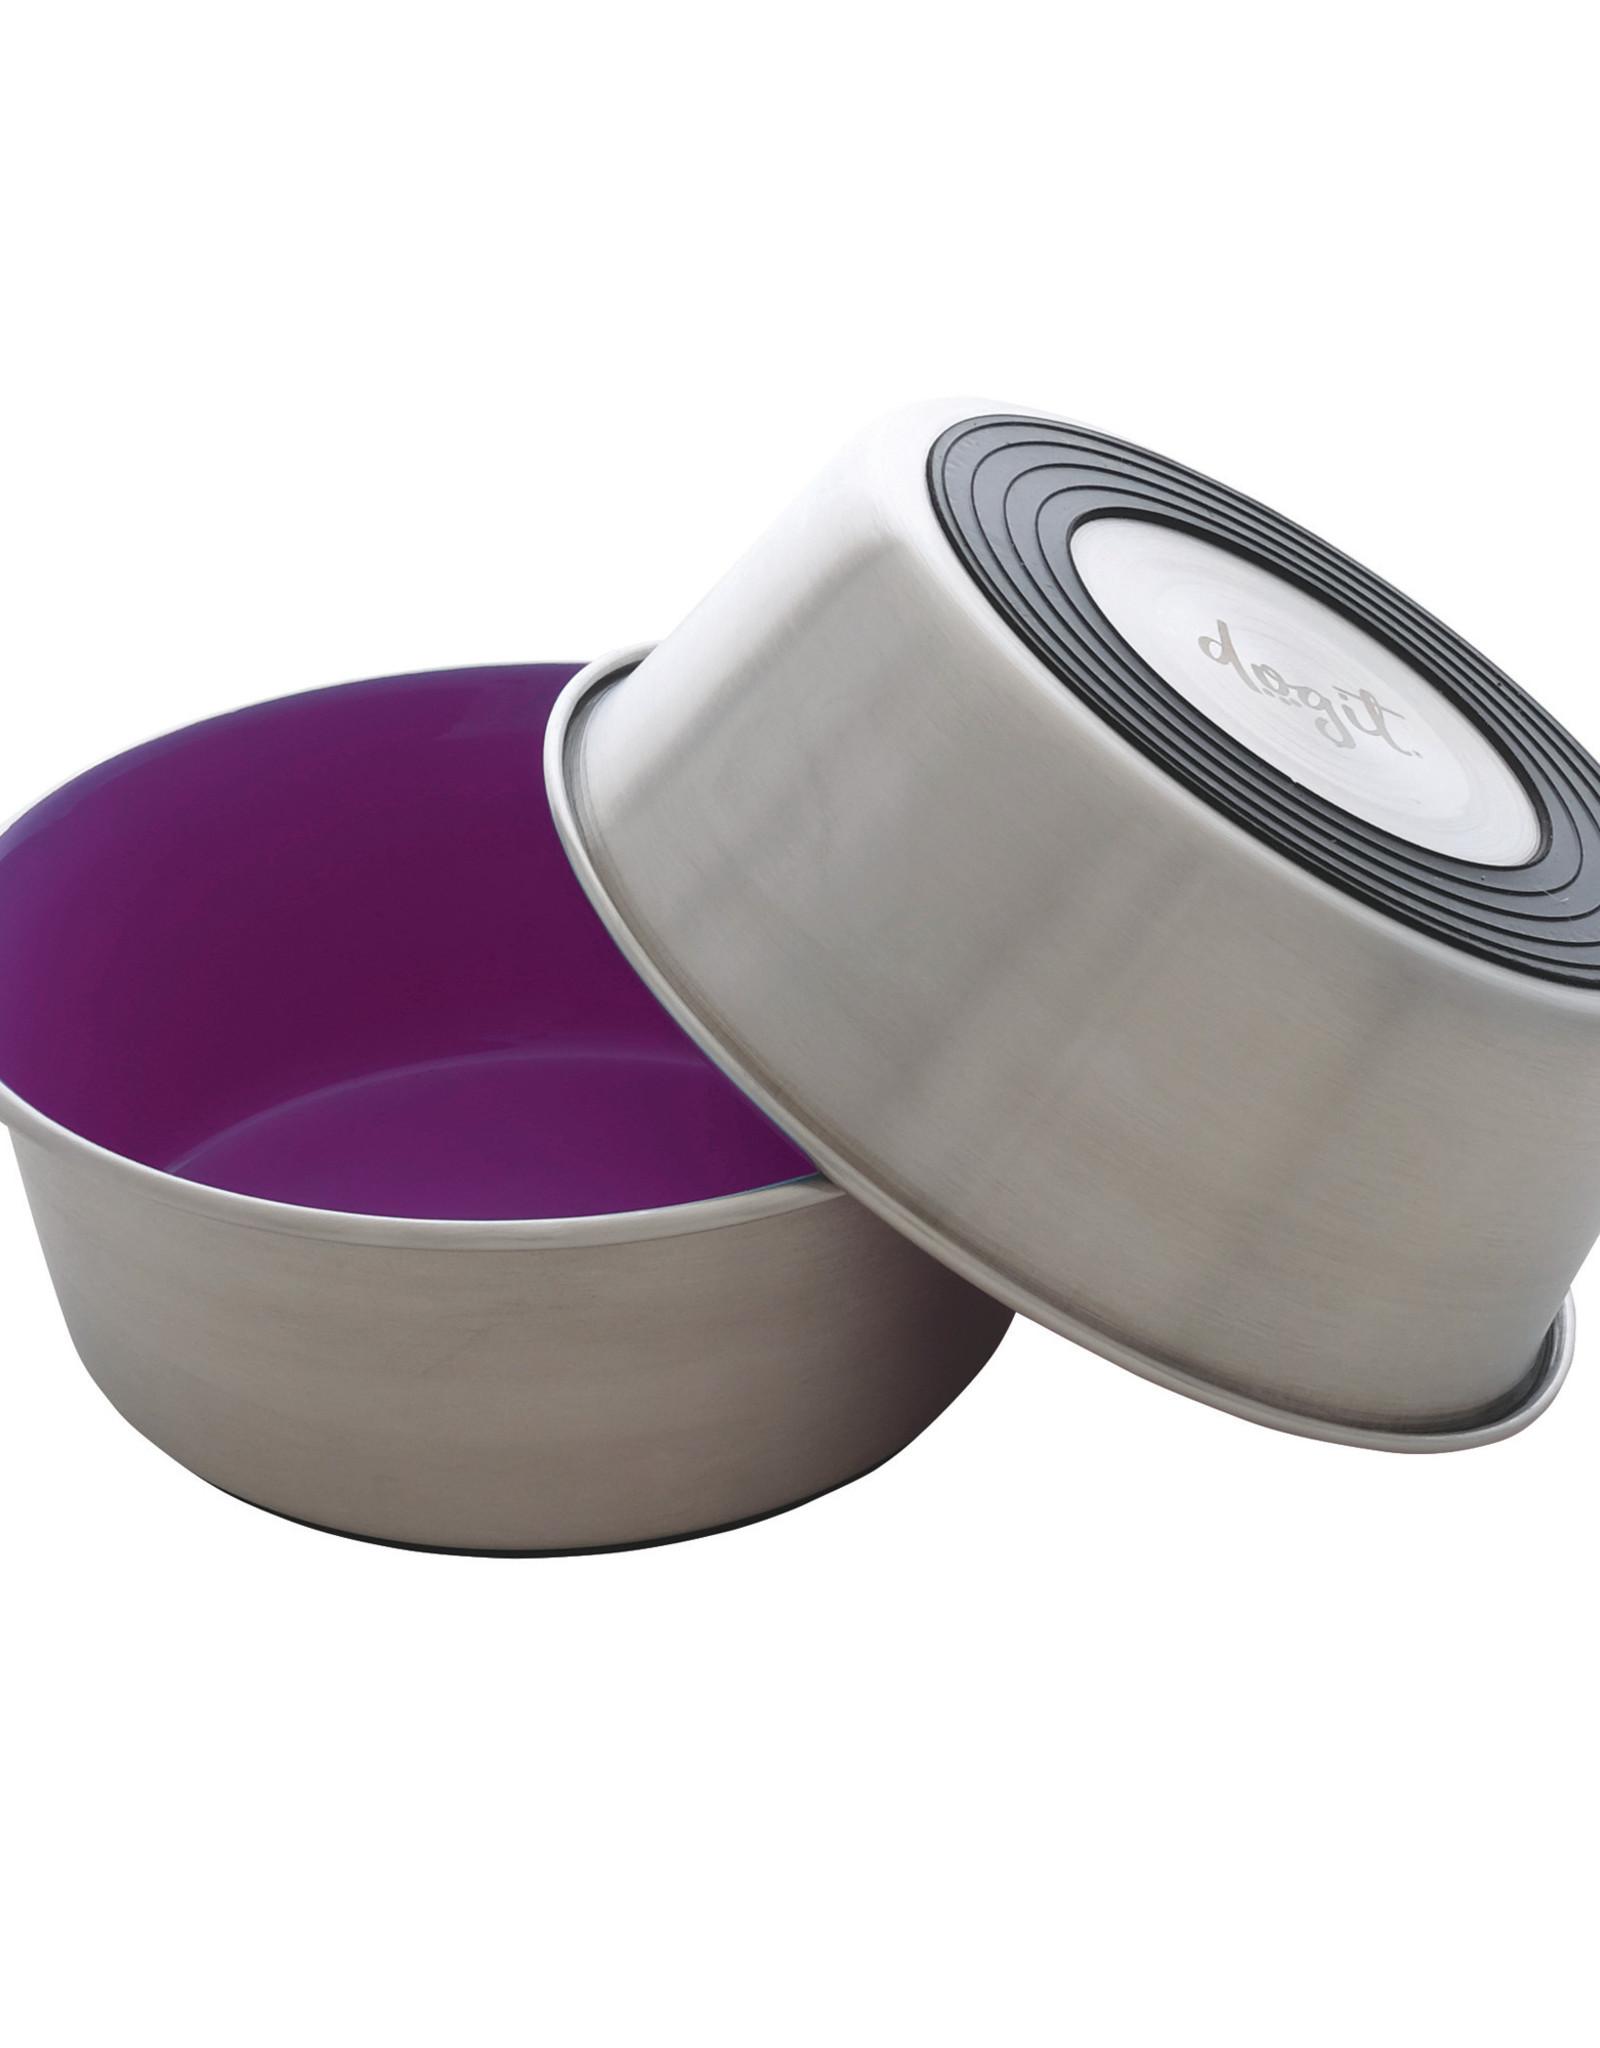 DogIt Dogit Stainless Steel Non-Skid Dog Bowl - Purple - 560 ml (19 fl.oz.)